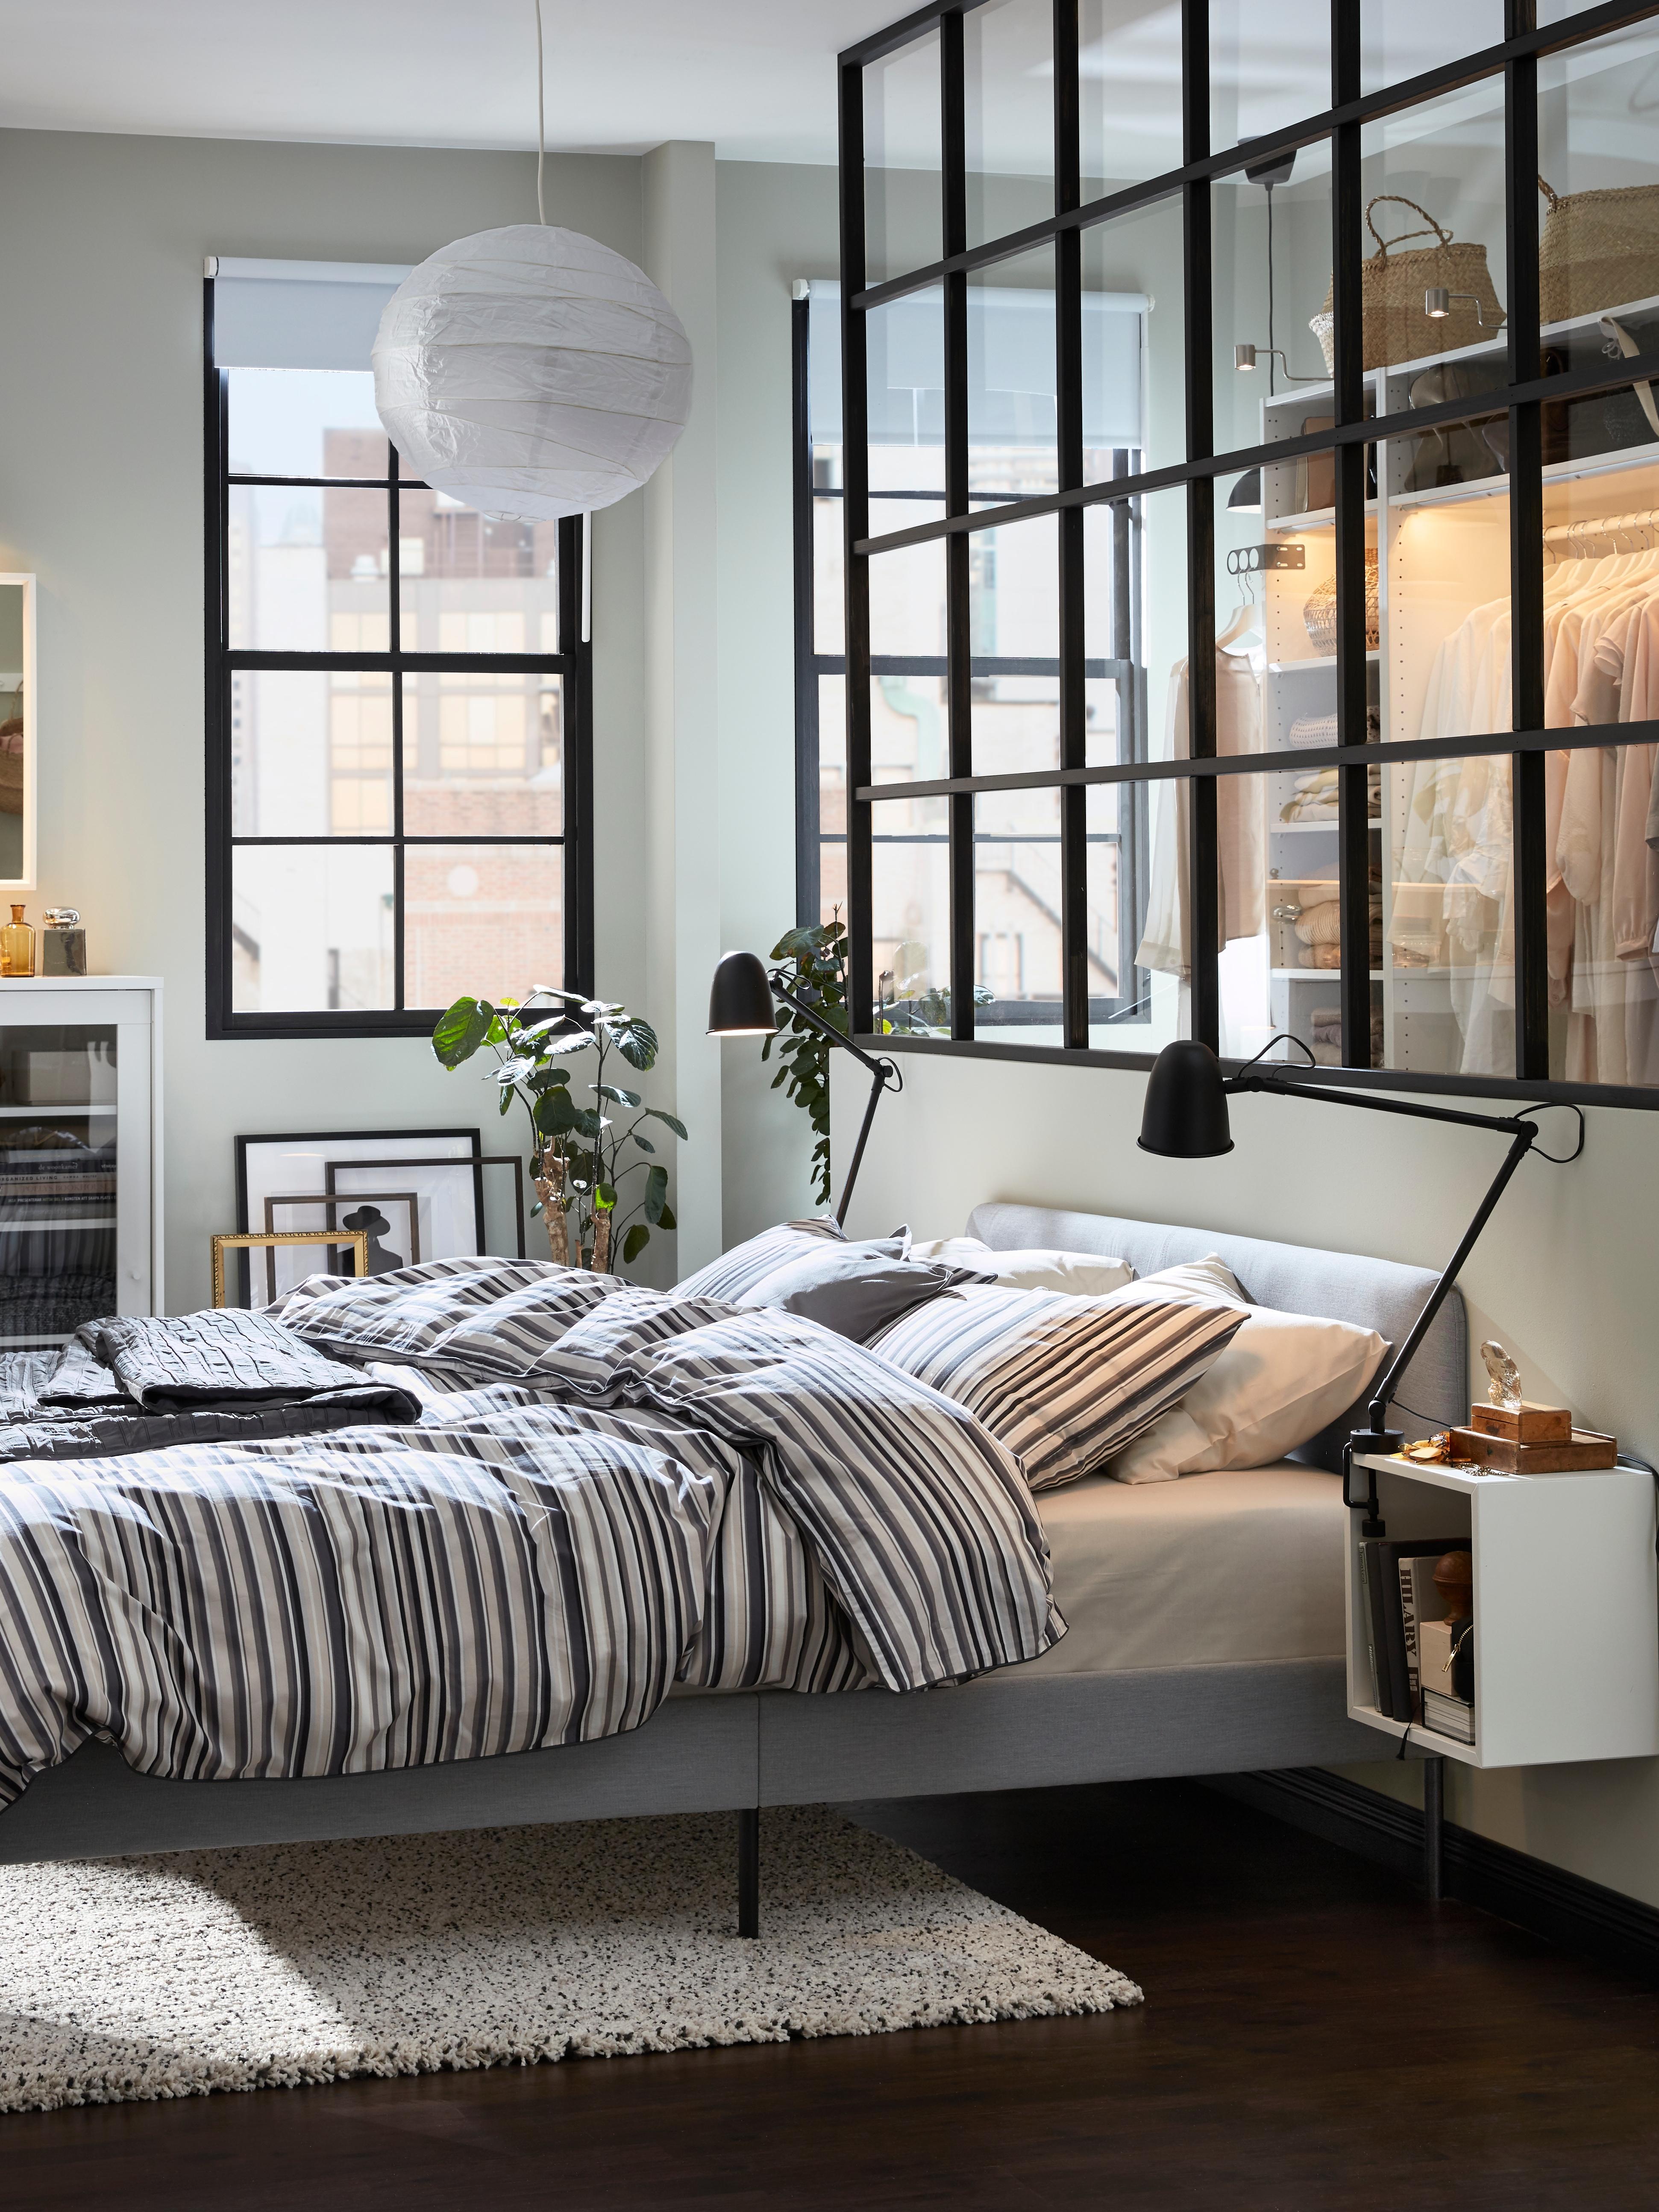 A modern, loft-like bedroom with a SLATTUM upholstered grey bed frame, a grey ru and black lamps on open bedside cubes.